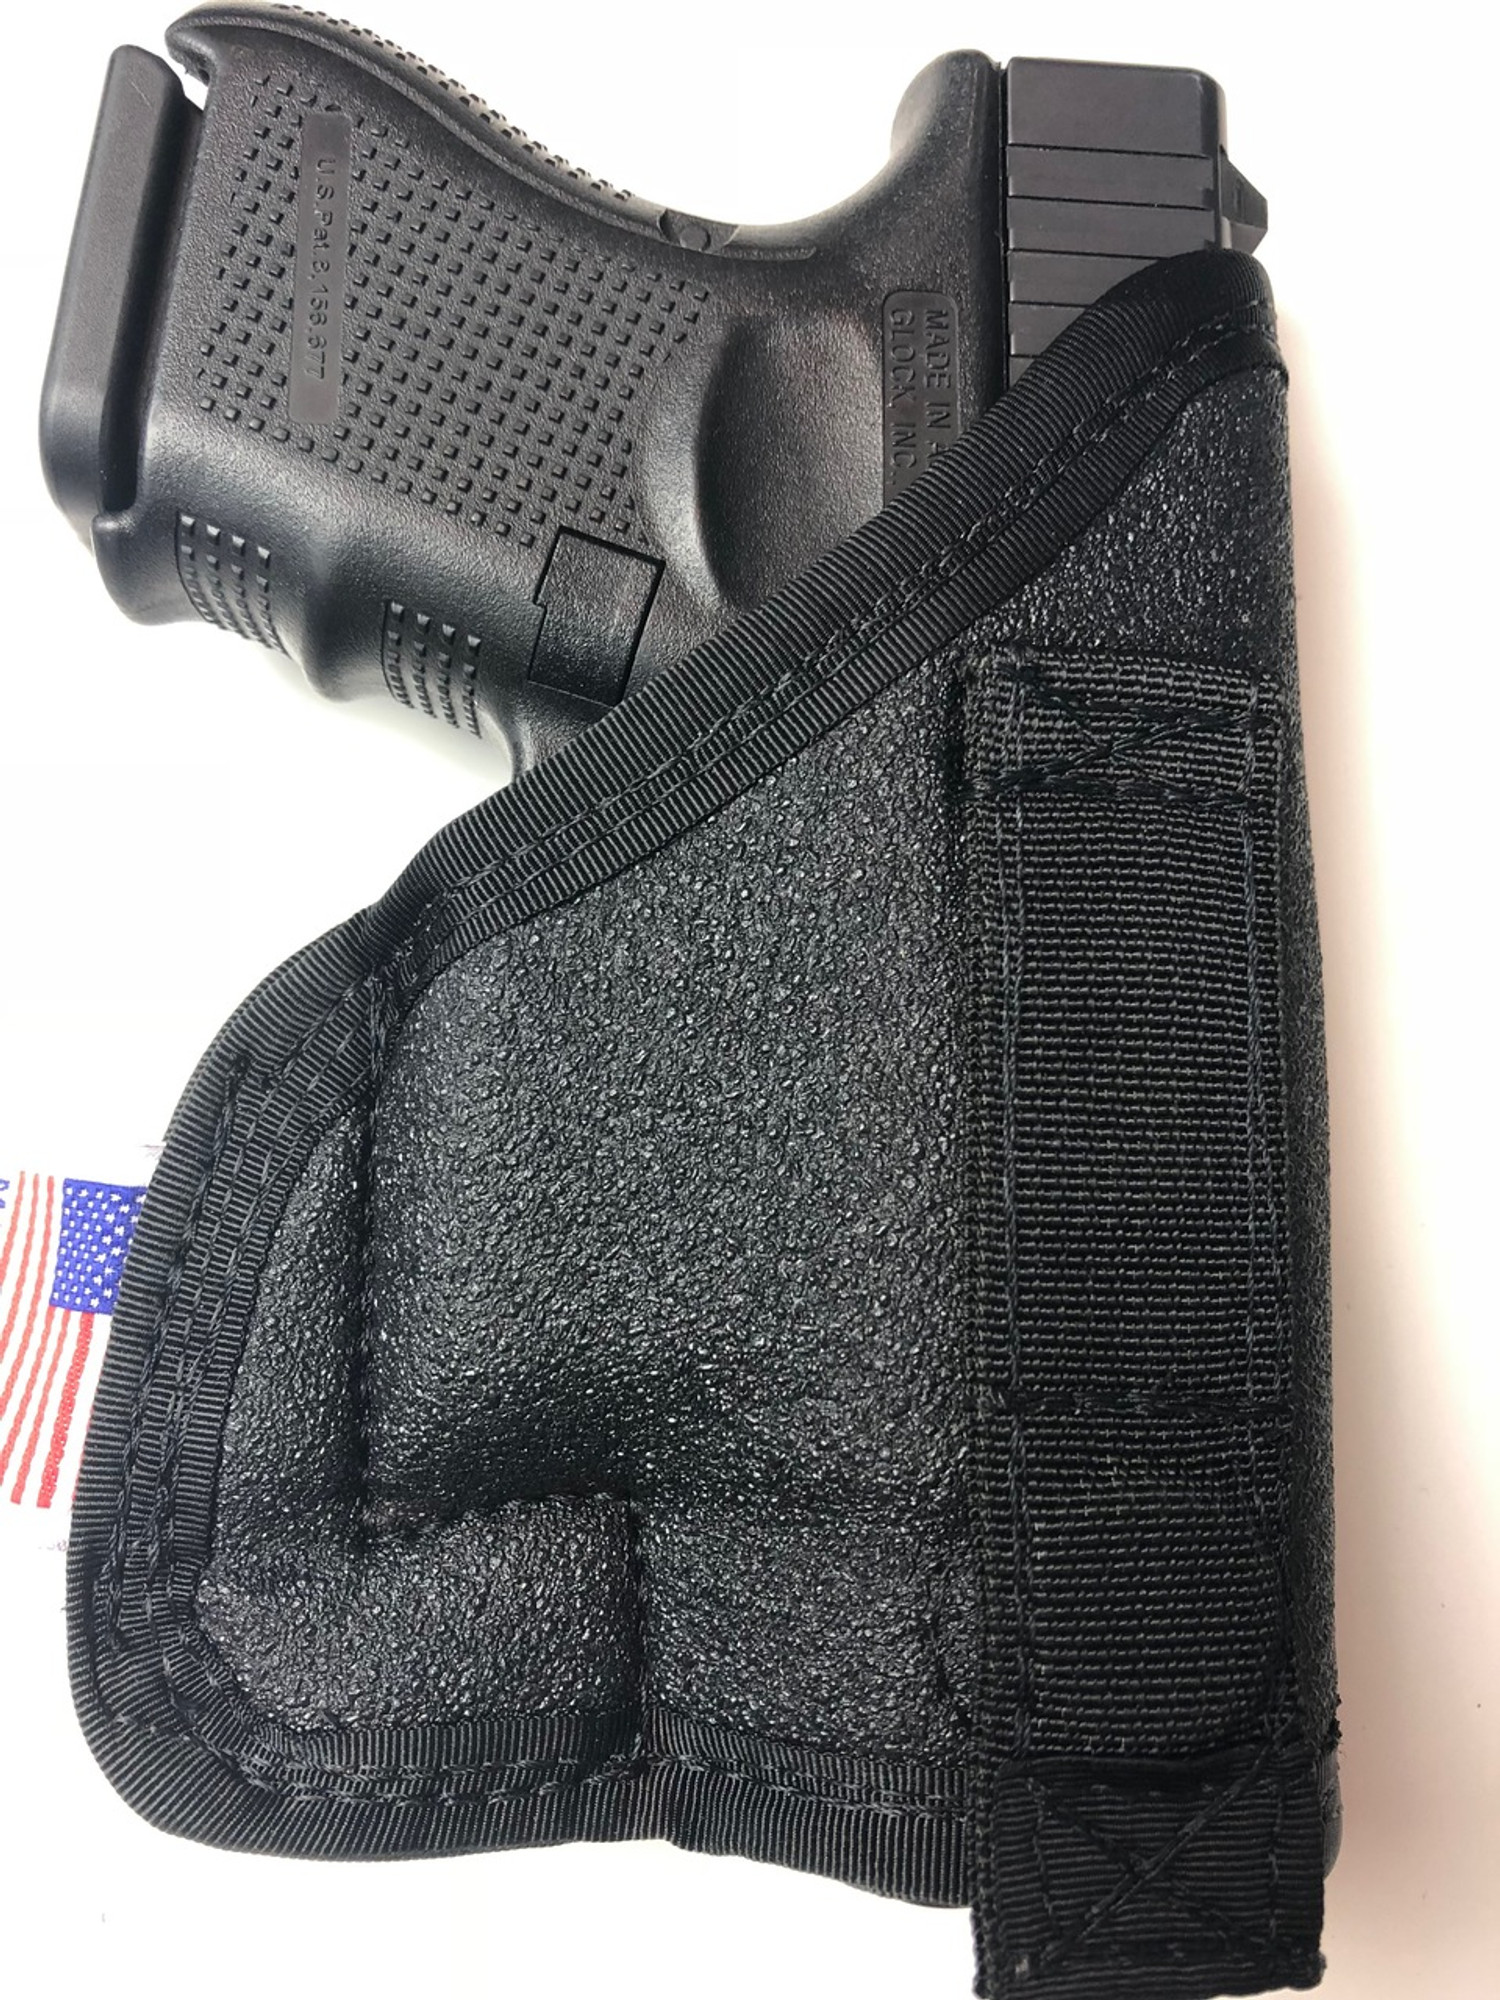 VersaPac IWB Concealed Carry Holster